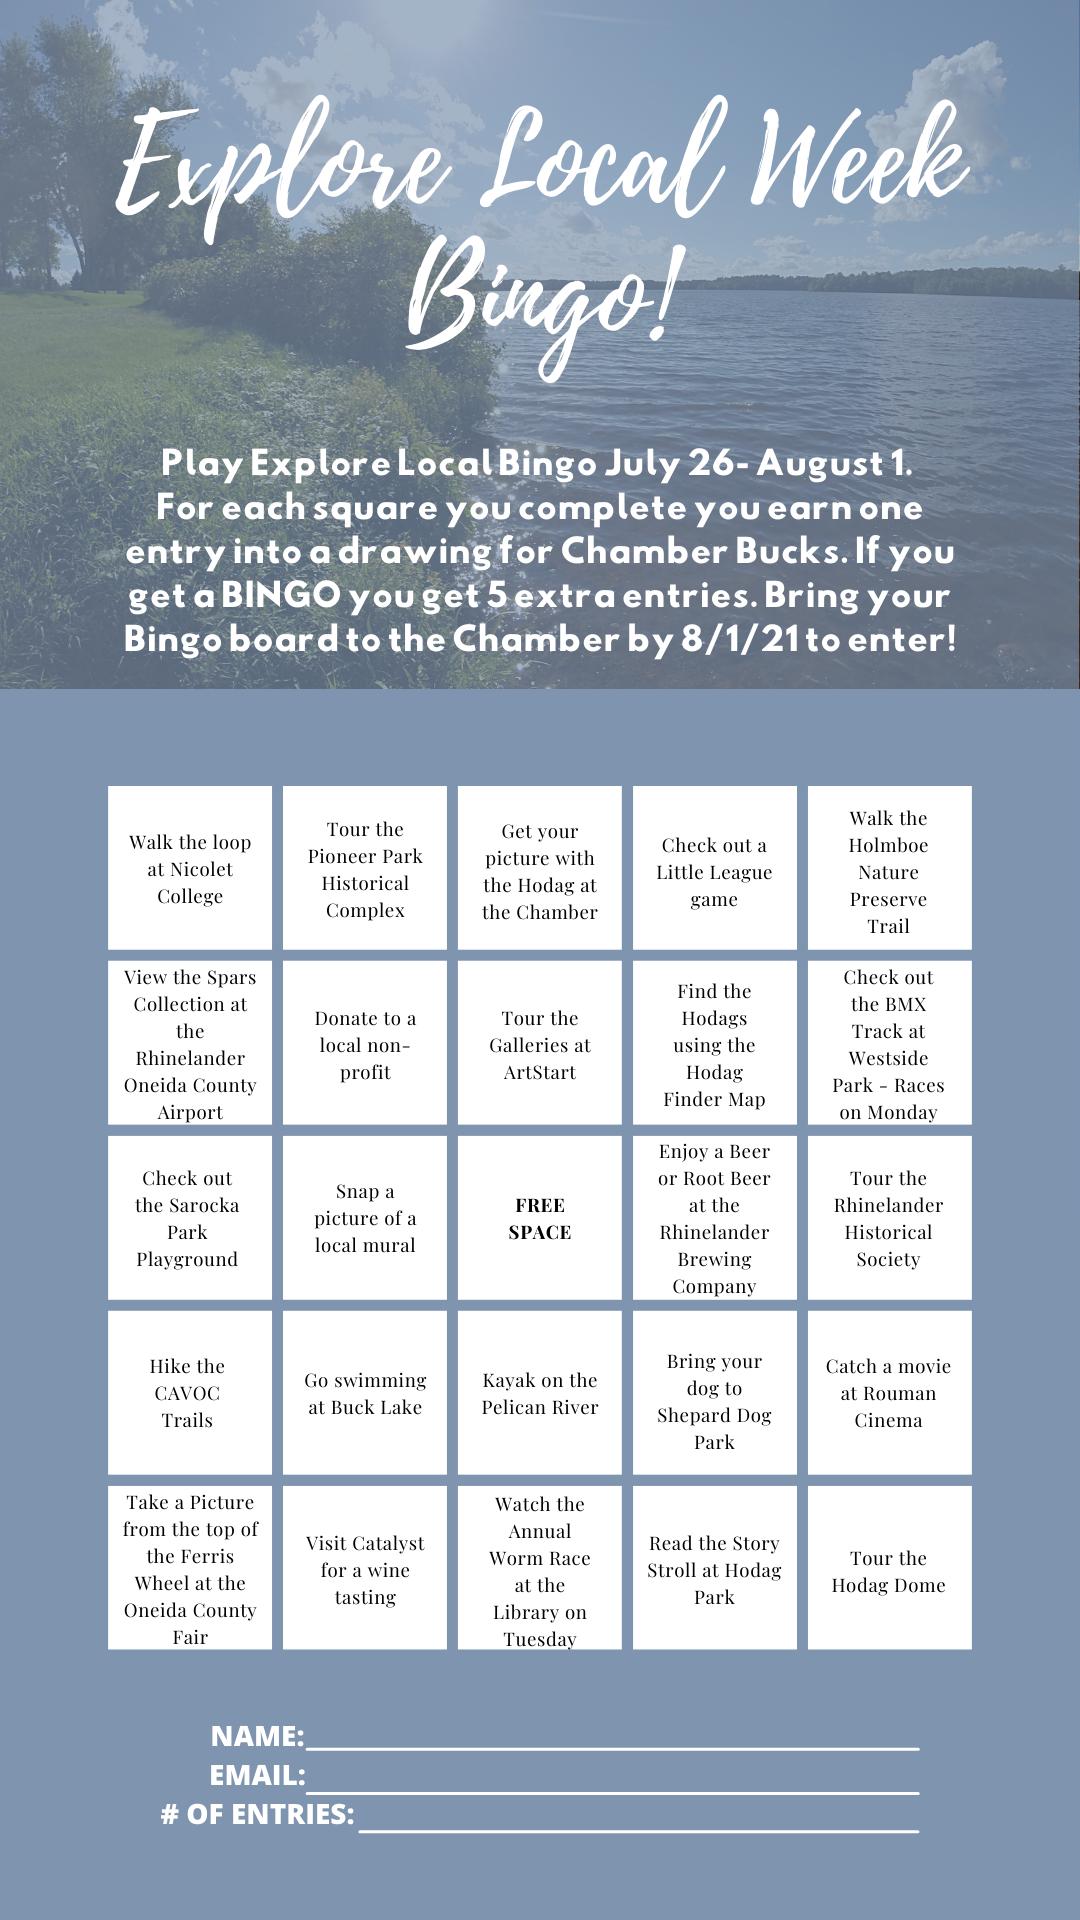 Explore-Local-Bingo-(1).png